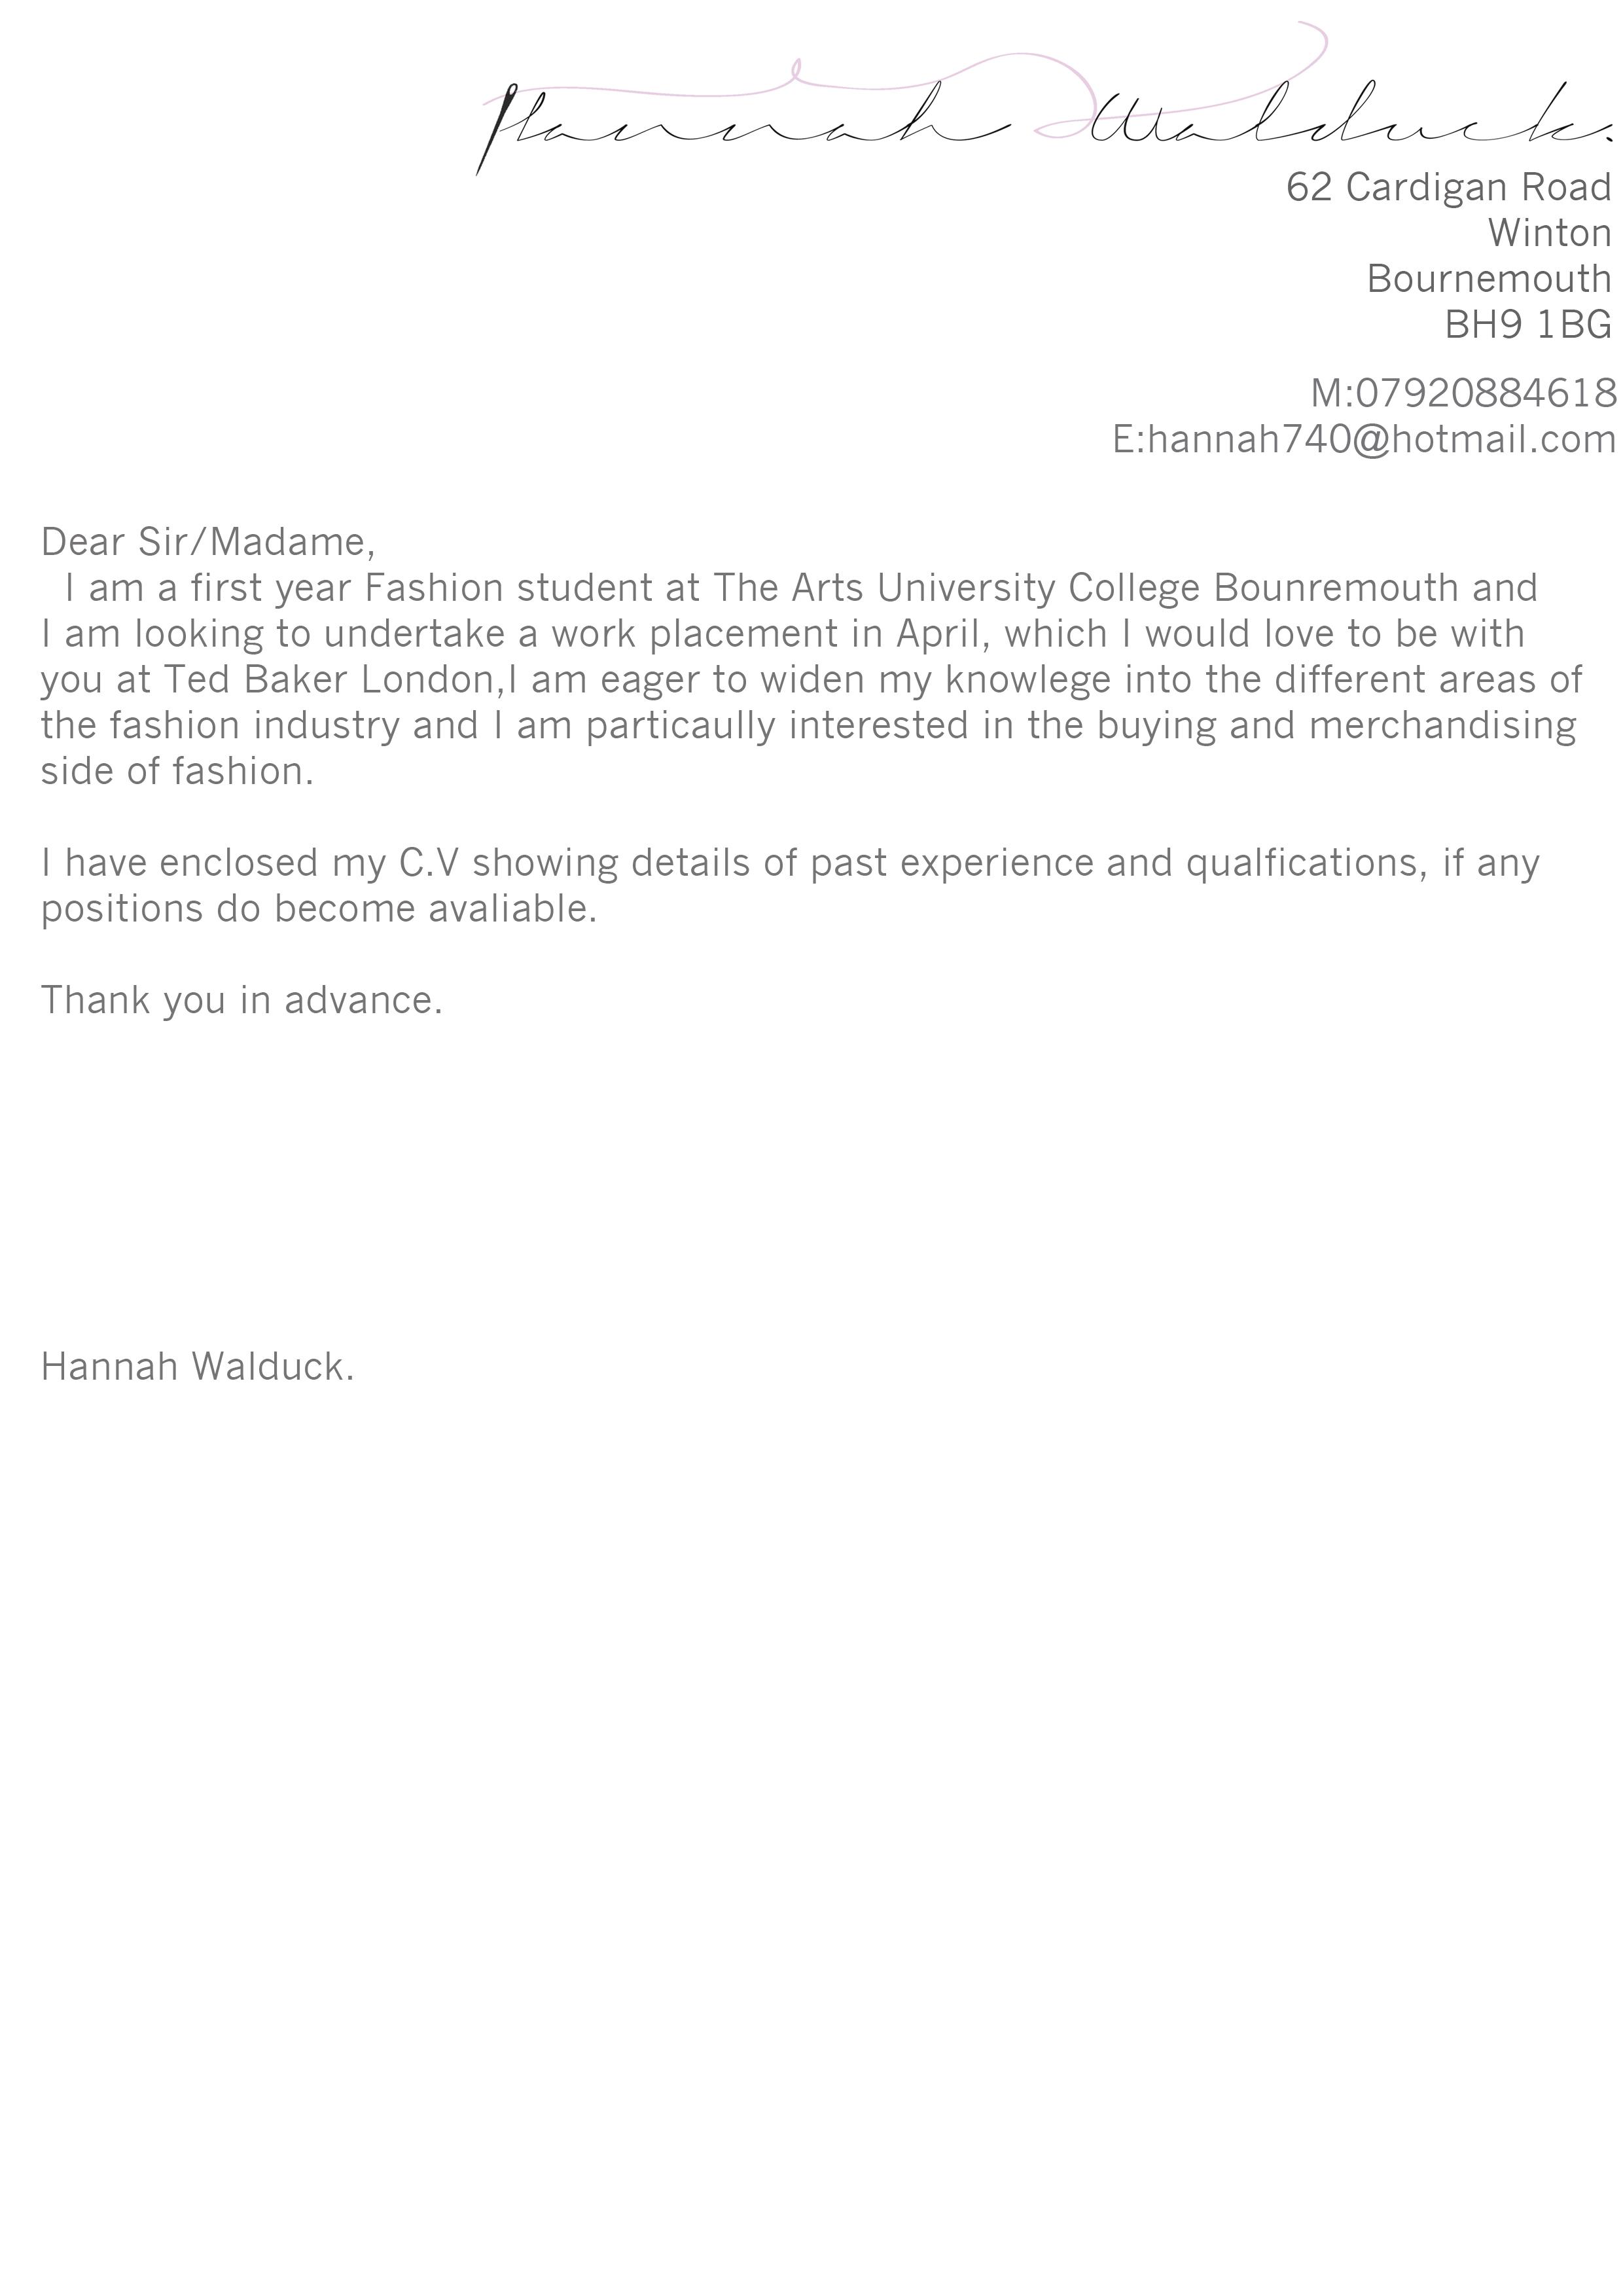 sample cv for applying to graduate school cv cover letter cover letter cv and cover letter cover letter fashion industry